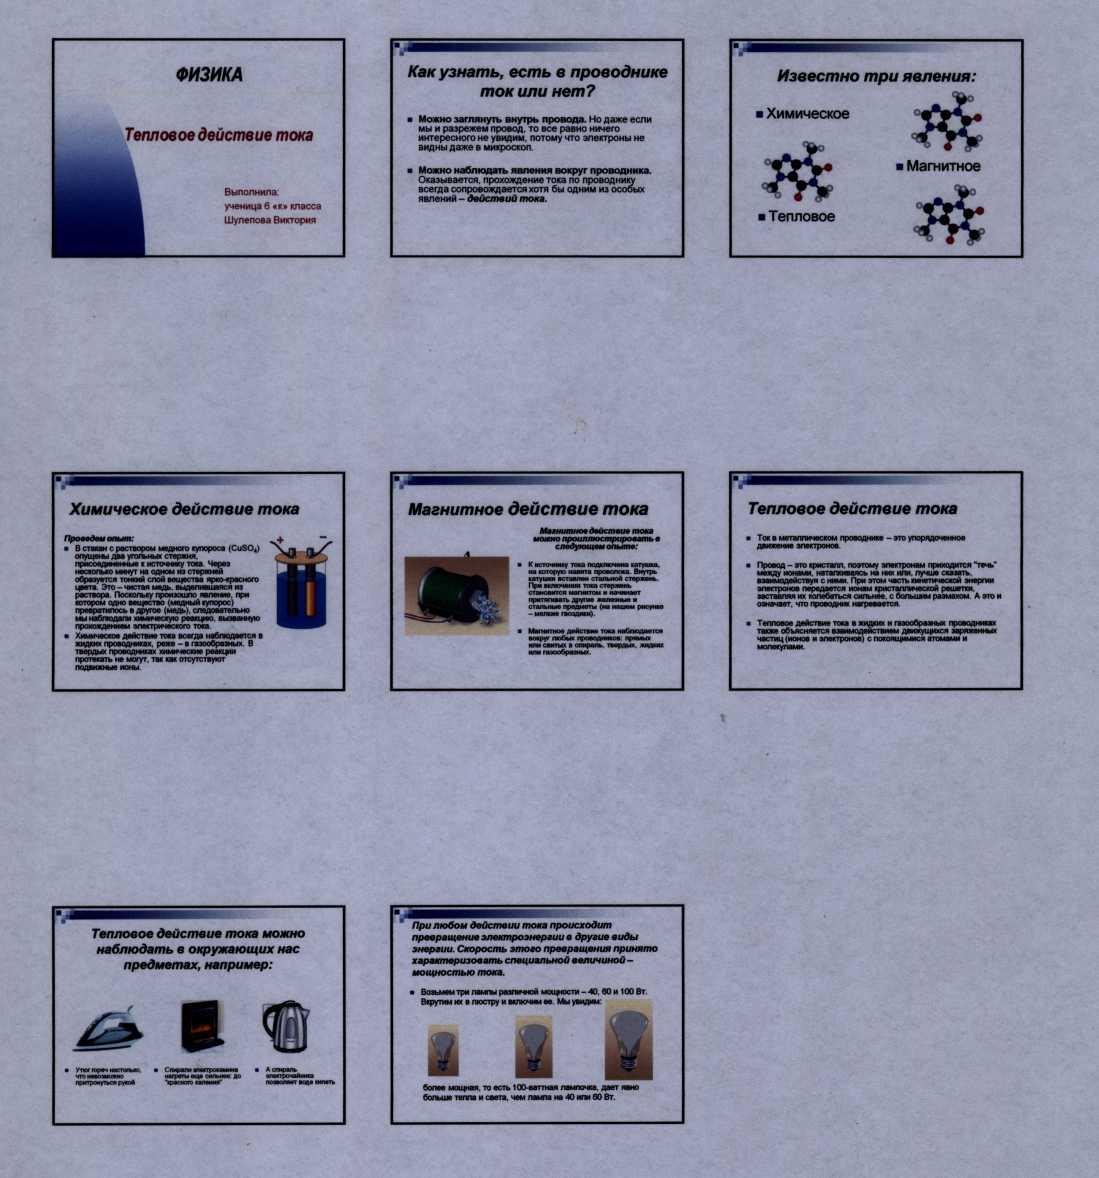 C:\Documents and Settings\Admin\Рабочий стол\media\image2.jpeg